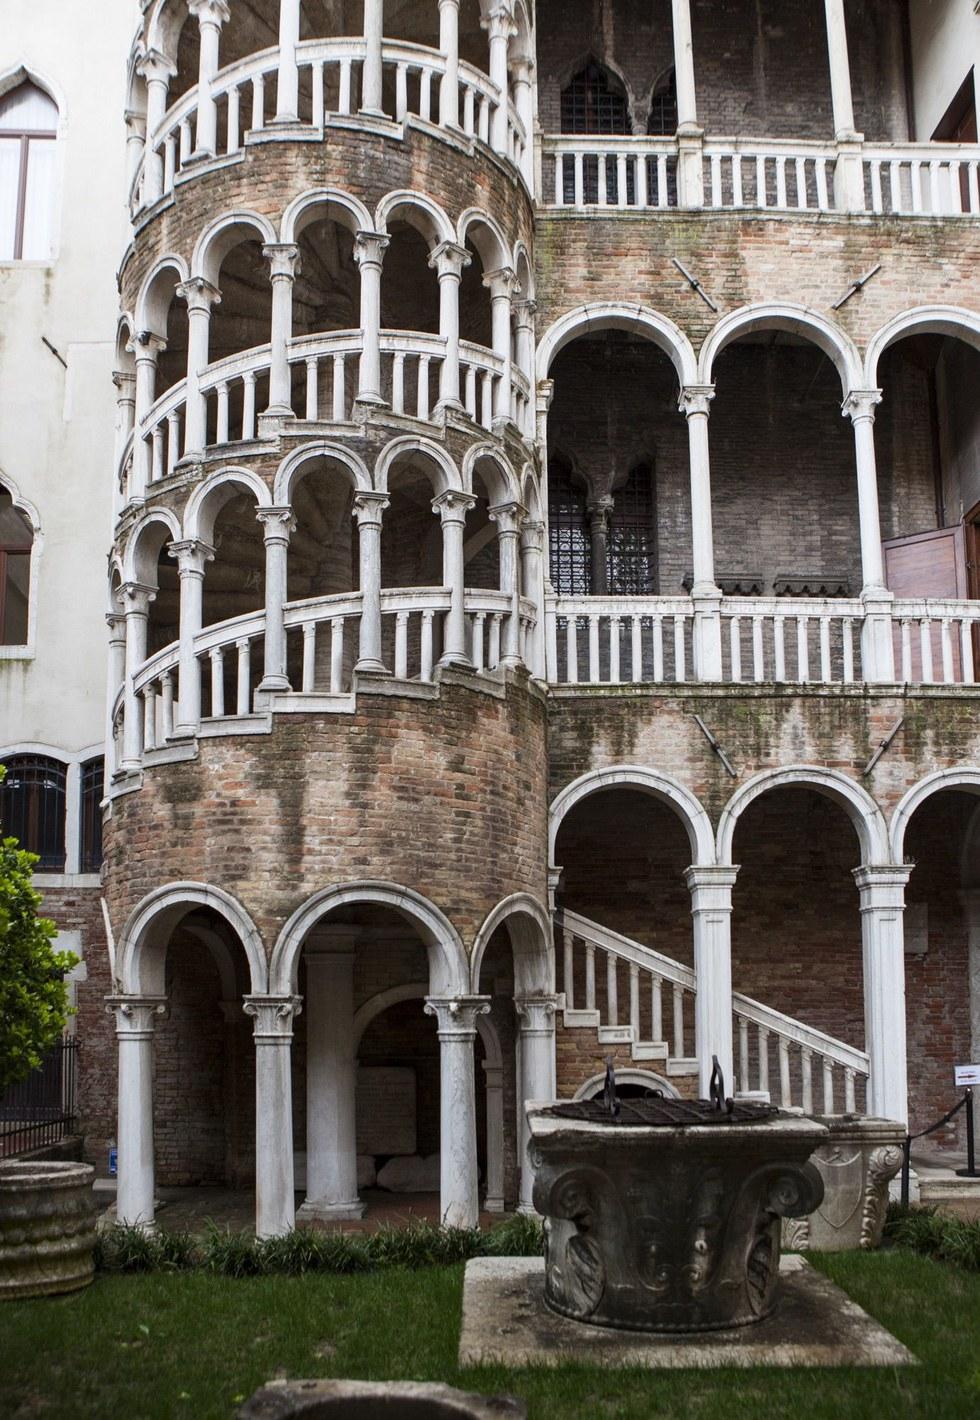 Palazzo Bovolo's external staircase